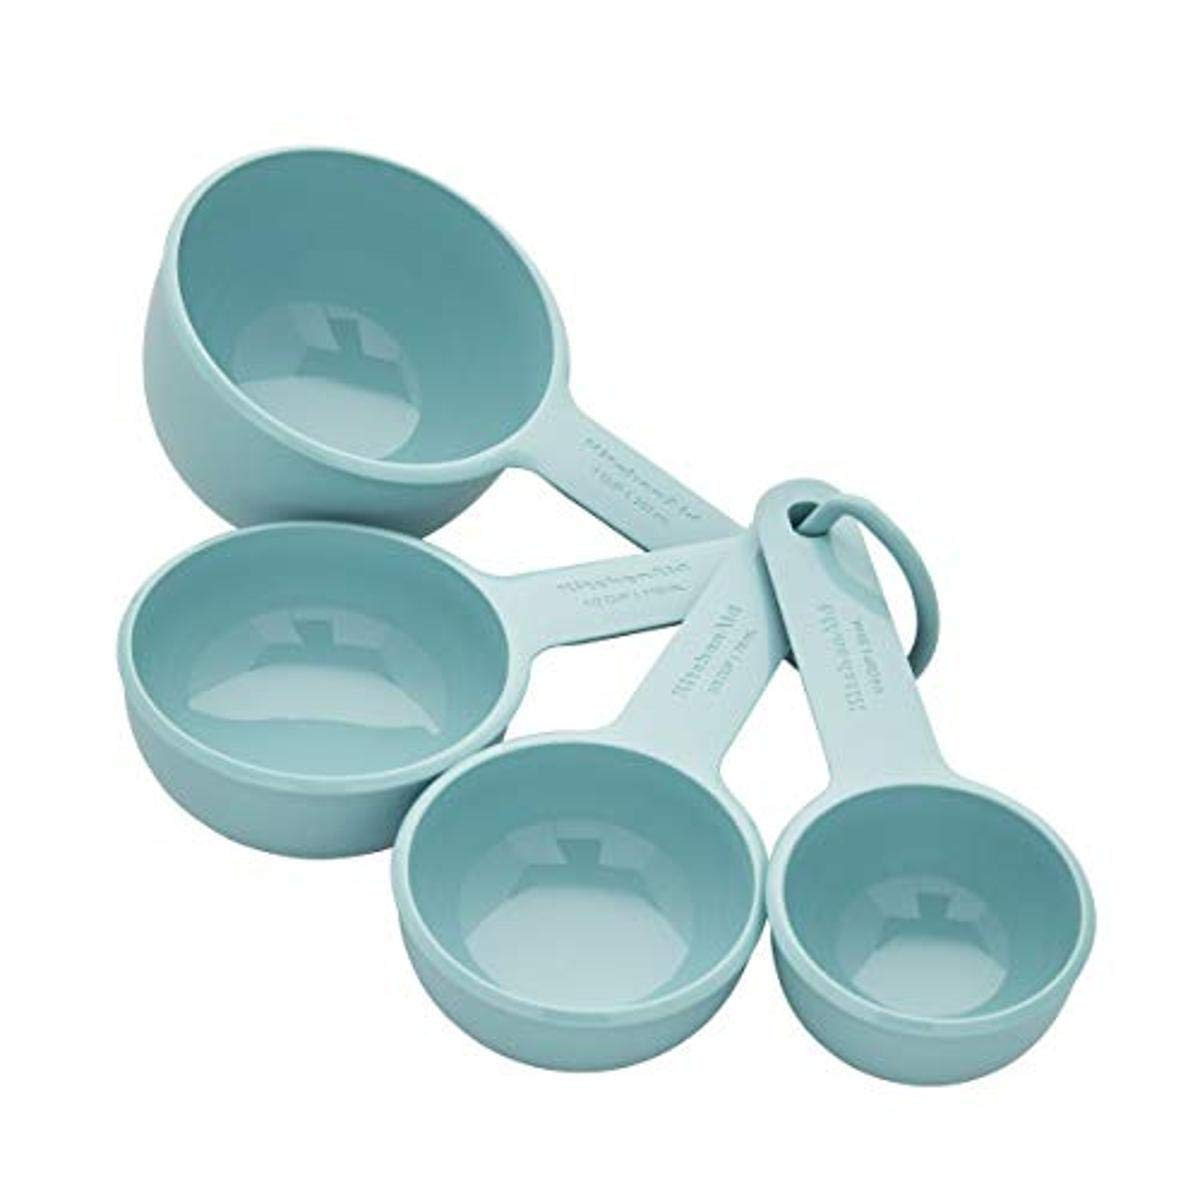 KitchenAid Measuring Cups, Set Of 4, Aqua Sky